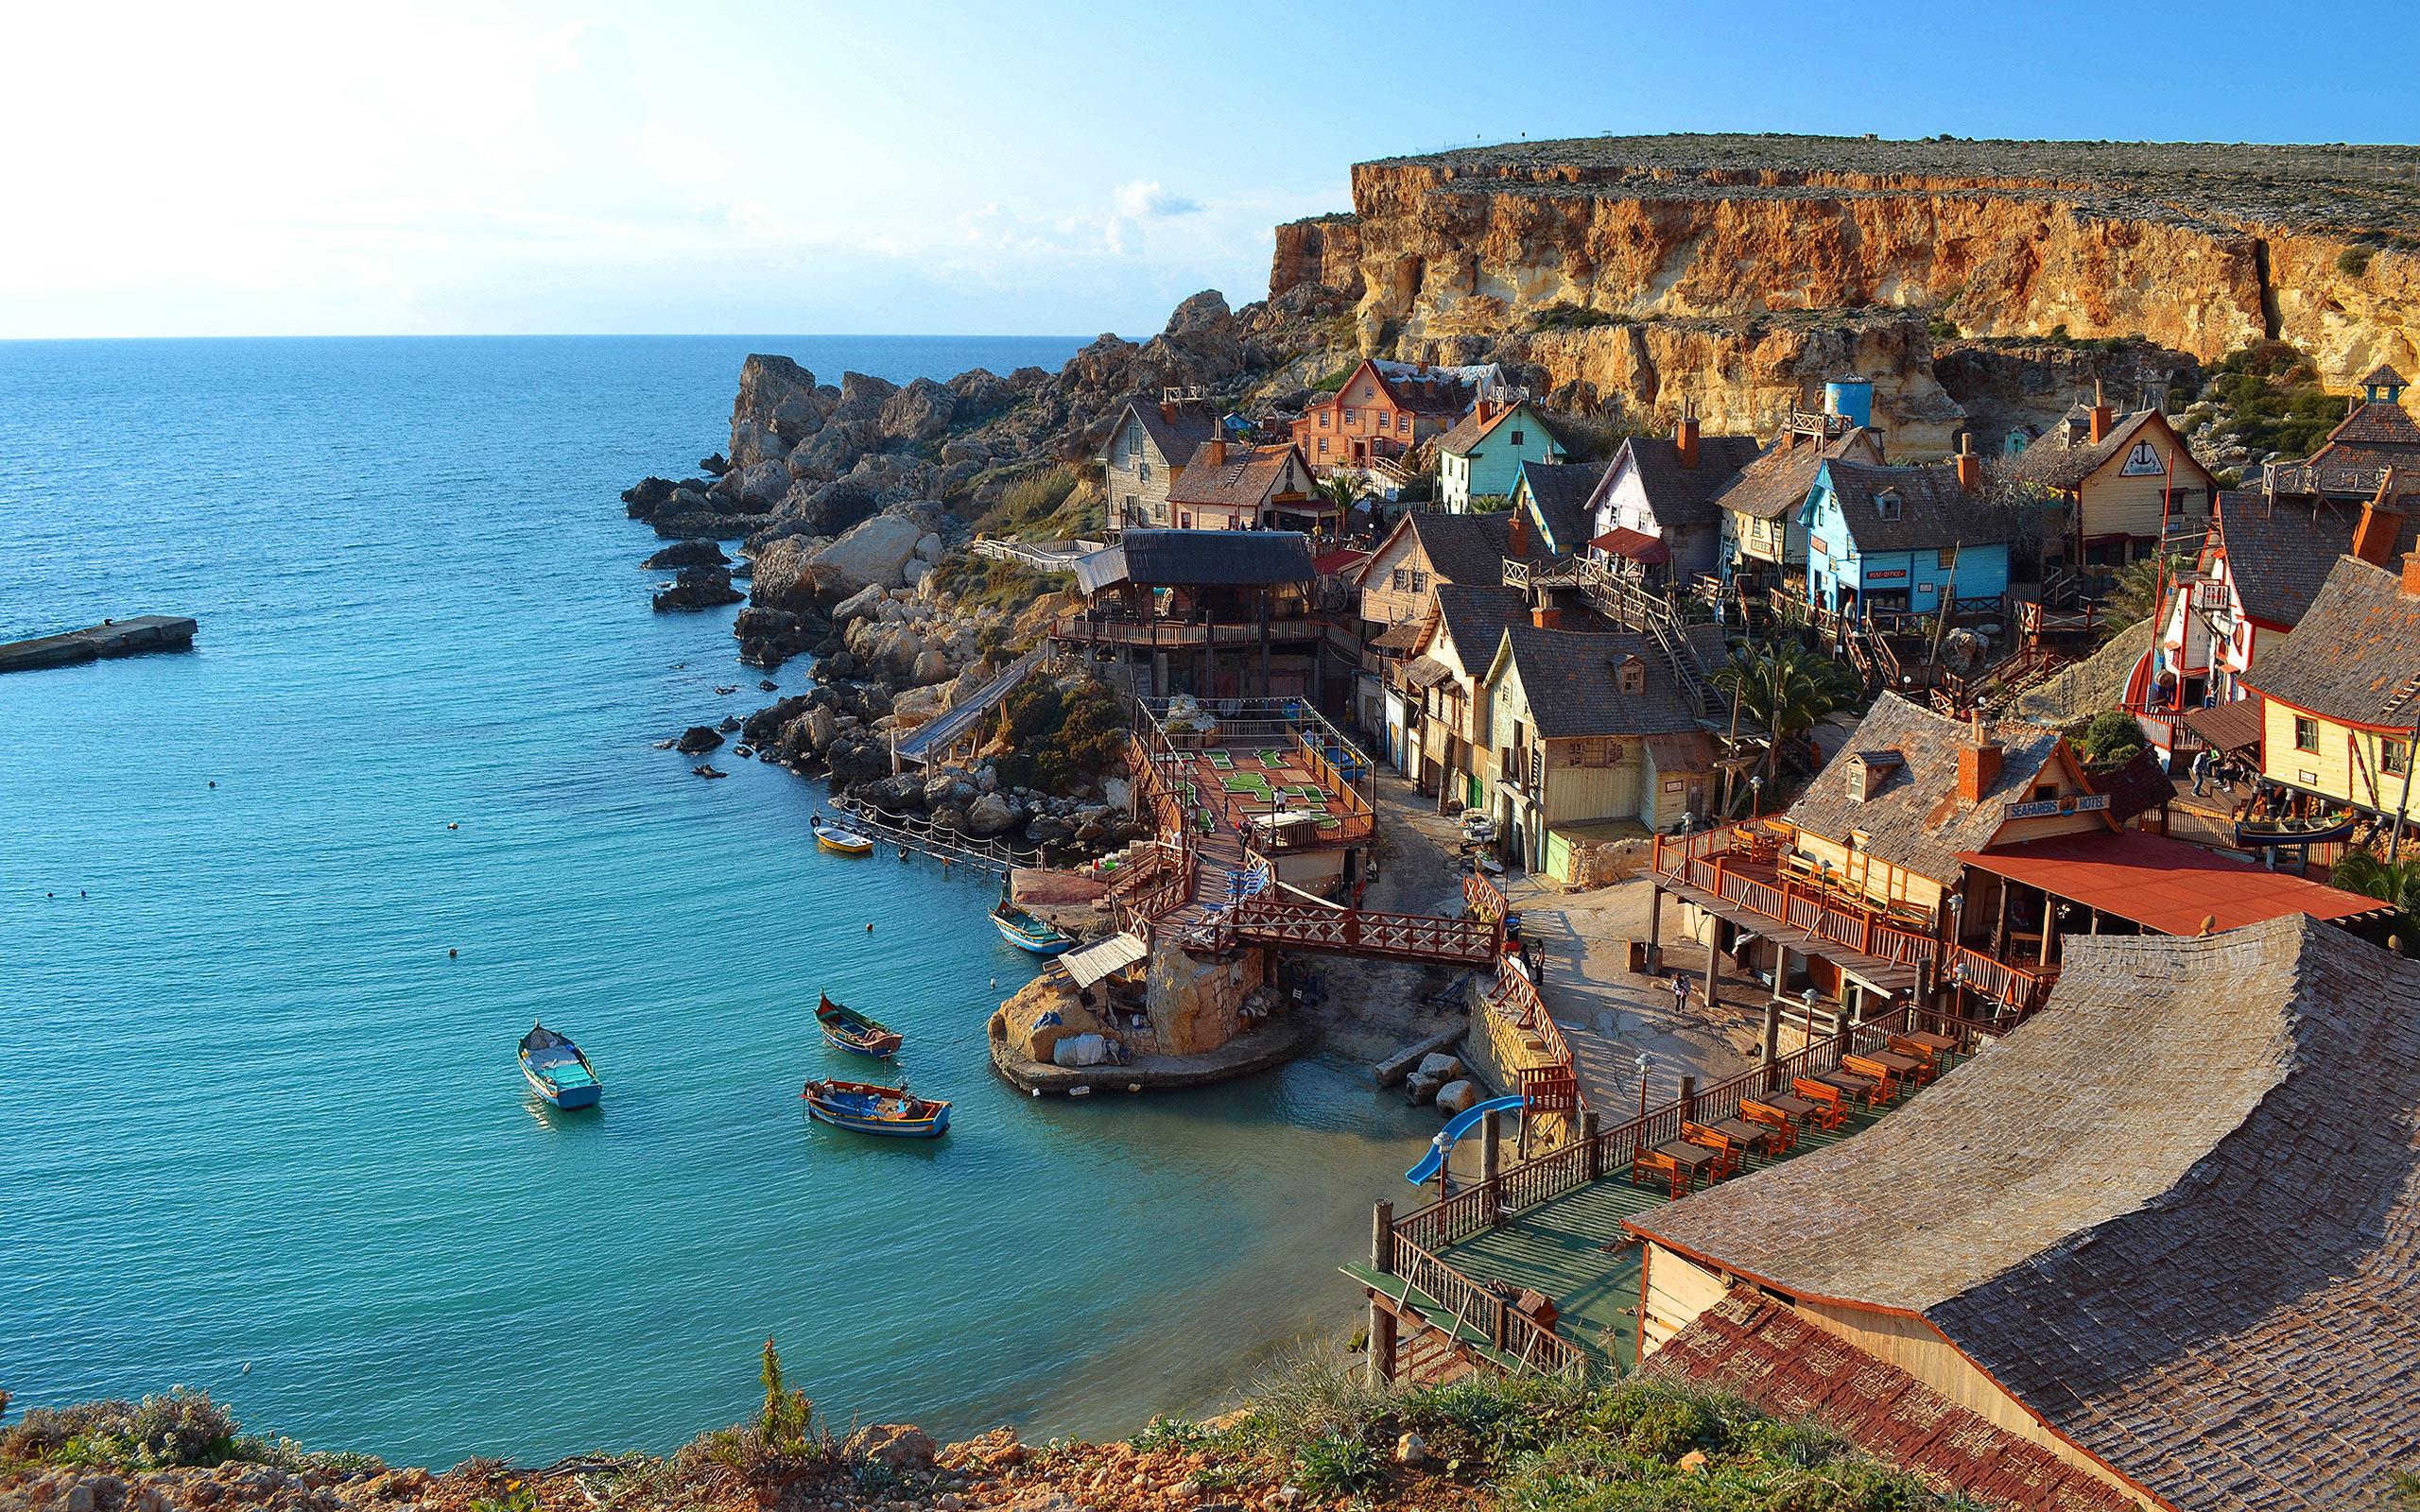 Love Cute Wallpaper Free Download Malta Anchor Bay Pictures Hd Desktop Wallpapers 4k Hd